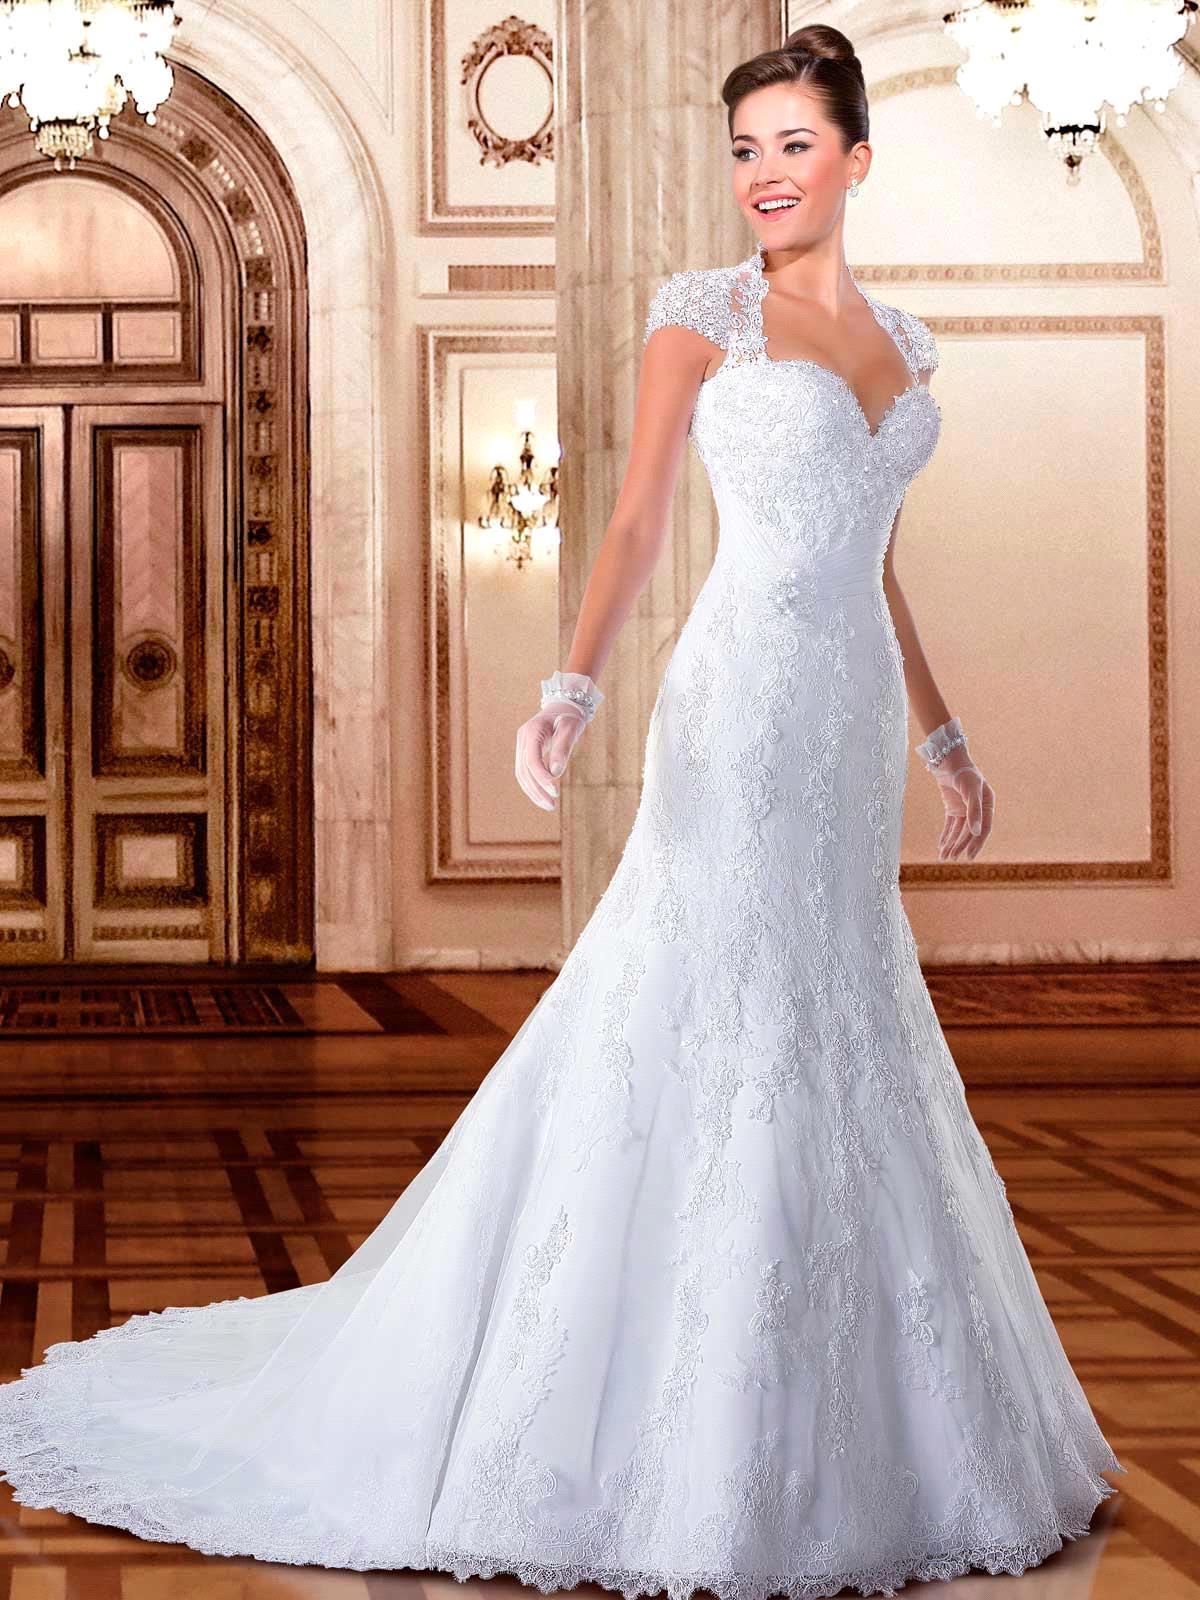 Aliexpress.com : Buy Vestidos De Noiva Custom Made Cap Sleeves Lace ...